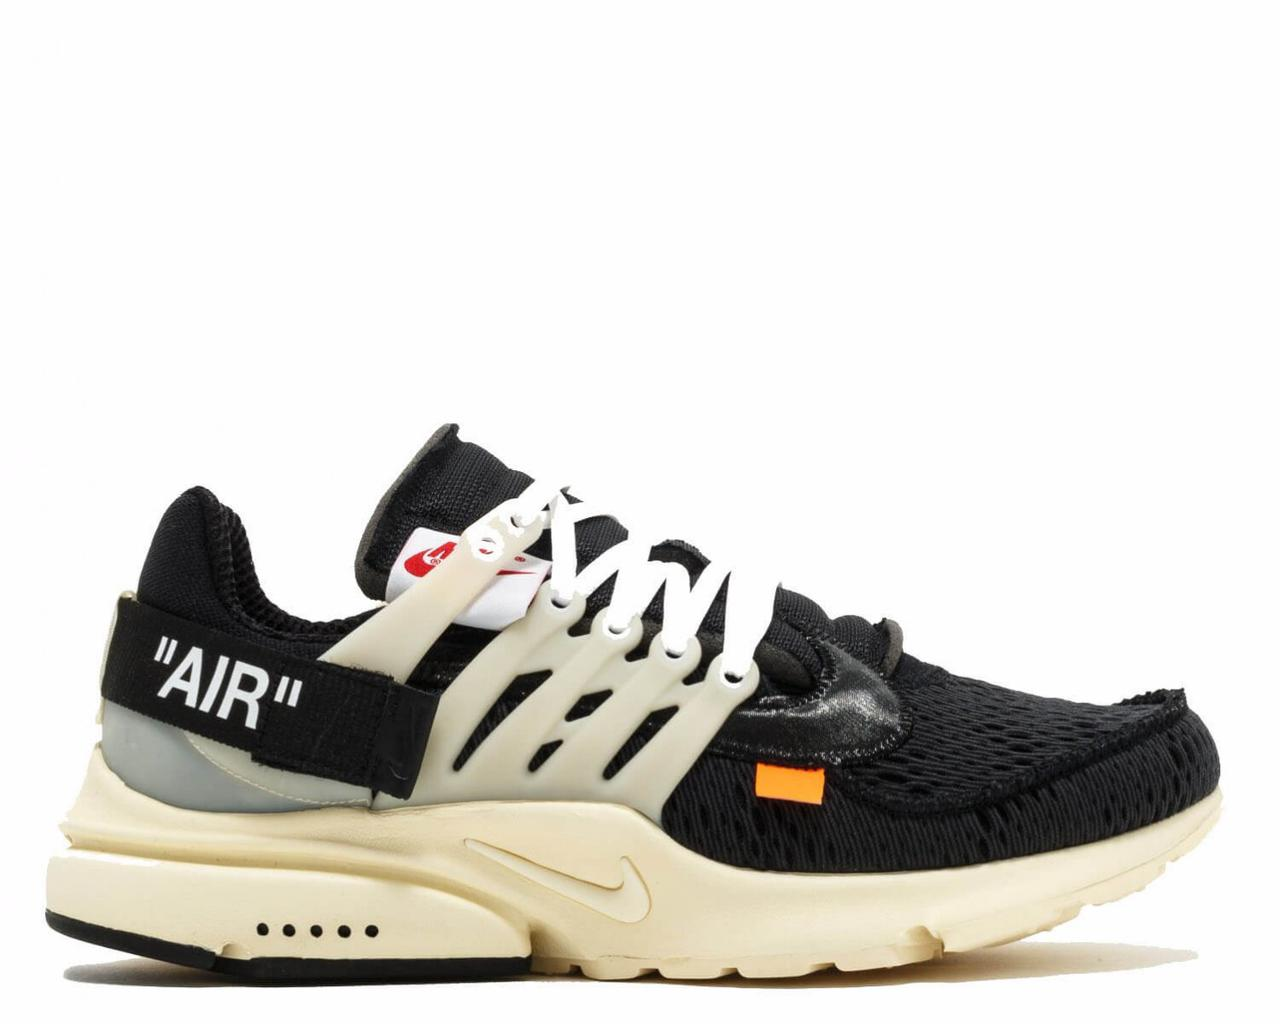 Кроссовки Nike Air Presto The Ten OW Off White (Найк Престо, Реплика) 41 —  в Категории